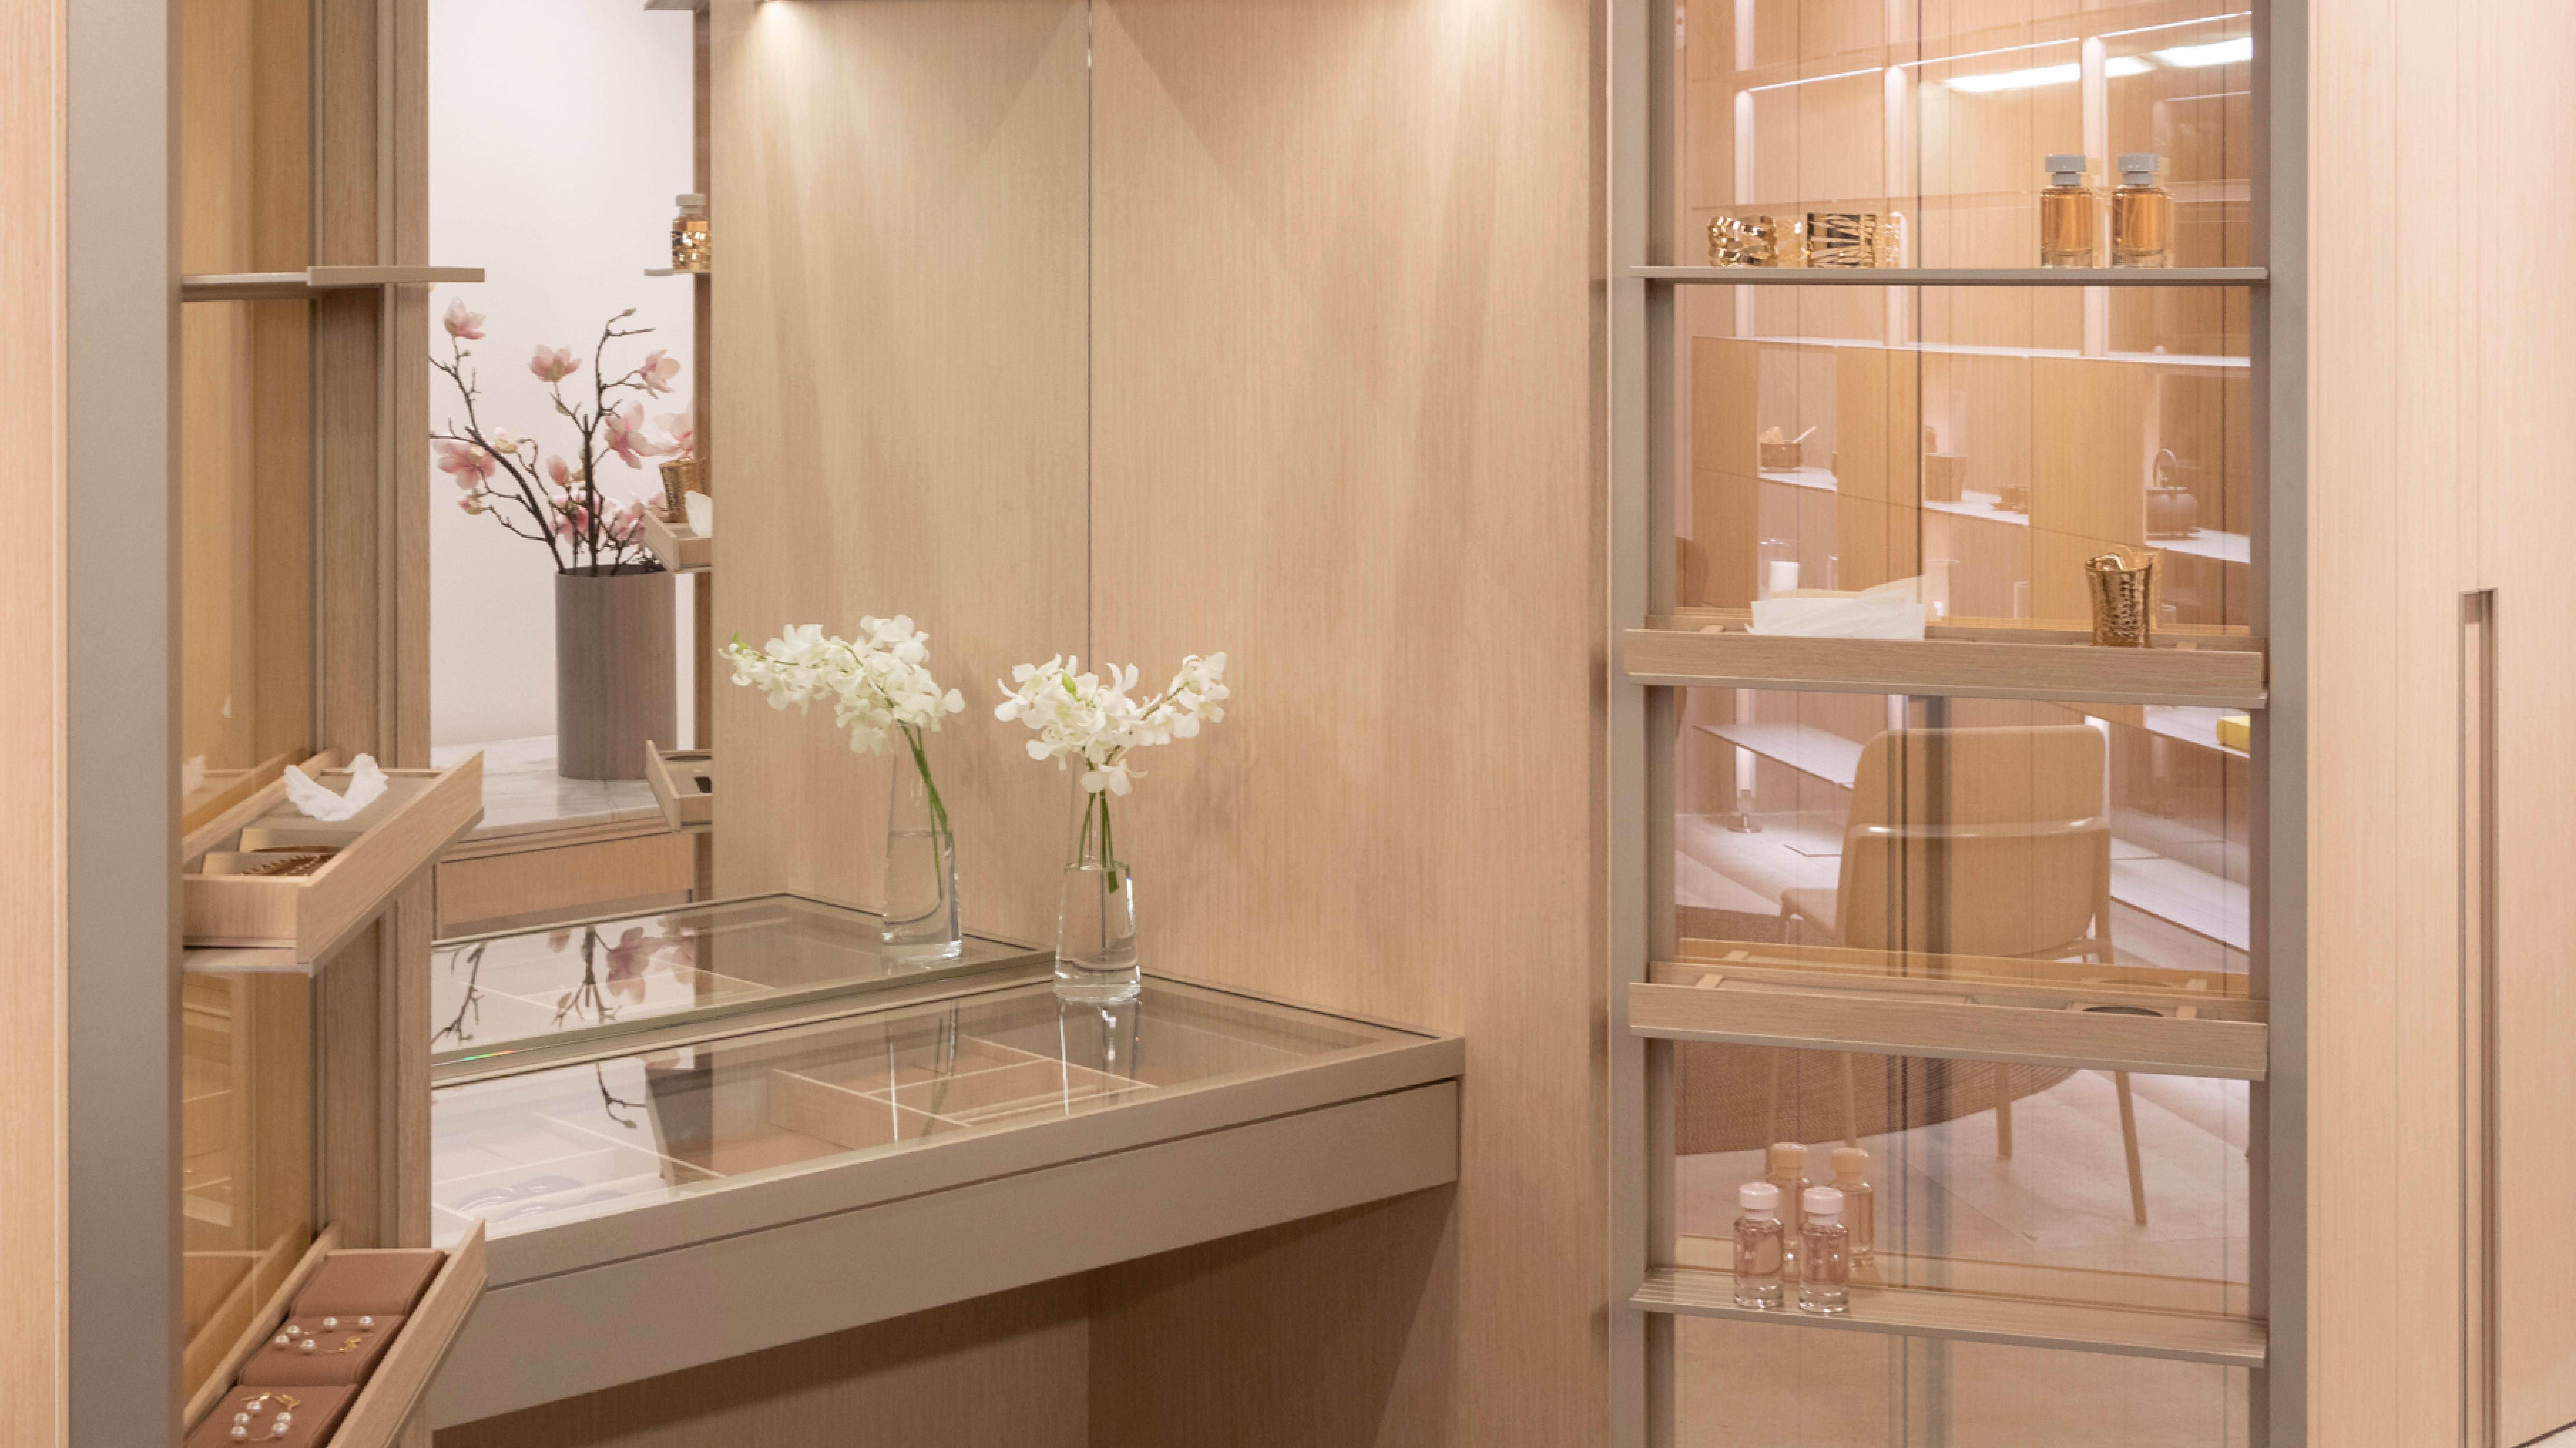 Little Luxury Office, por Ricardo Bello Dias.